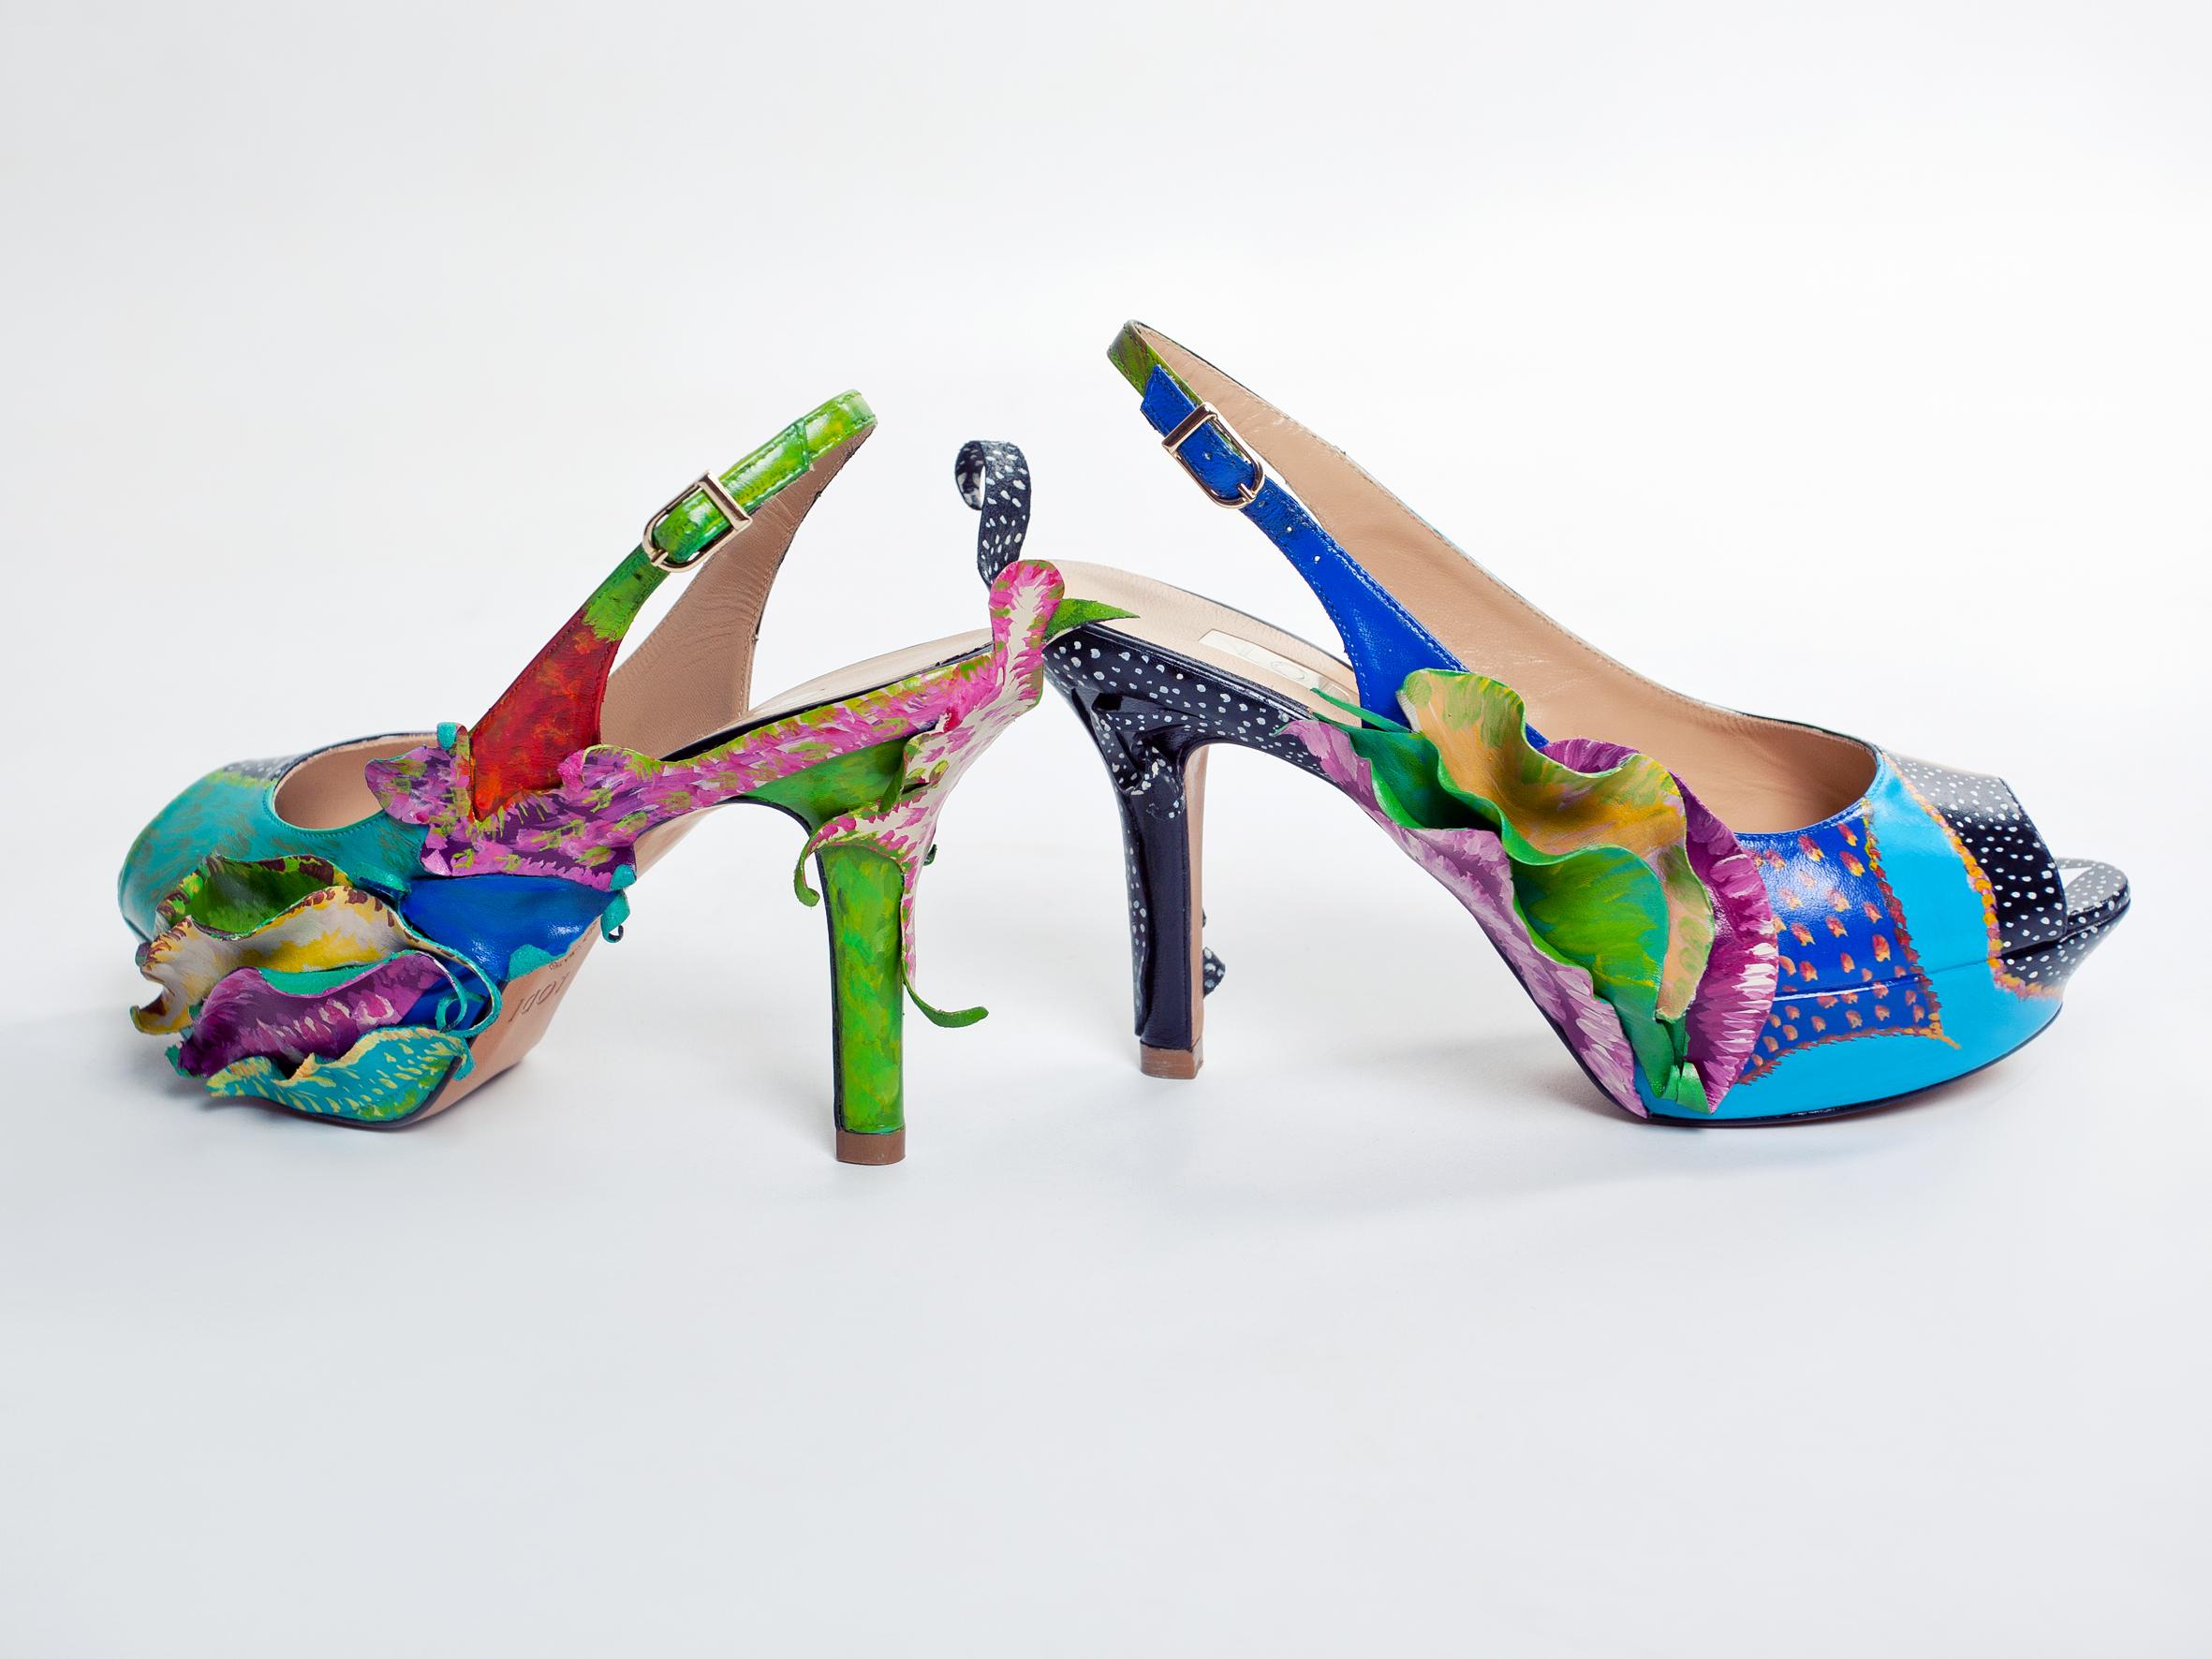 A Terelu Mano Para CamposBlogbeatrizsoto Zapatos Pintados Lc45qAR3j